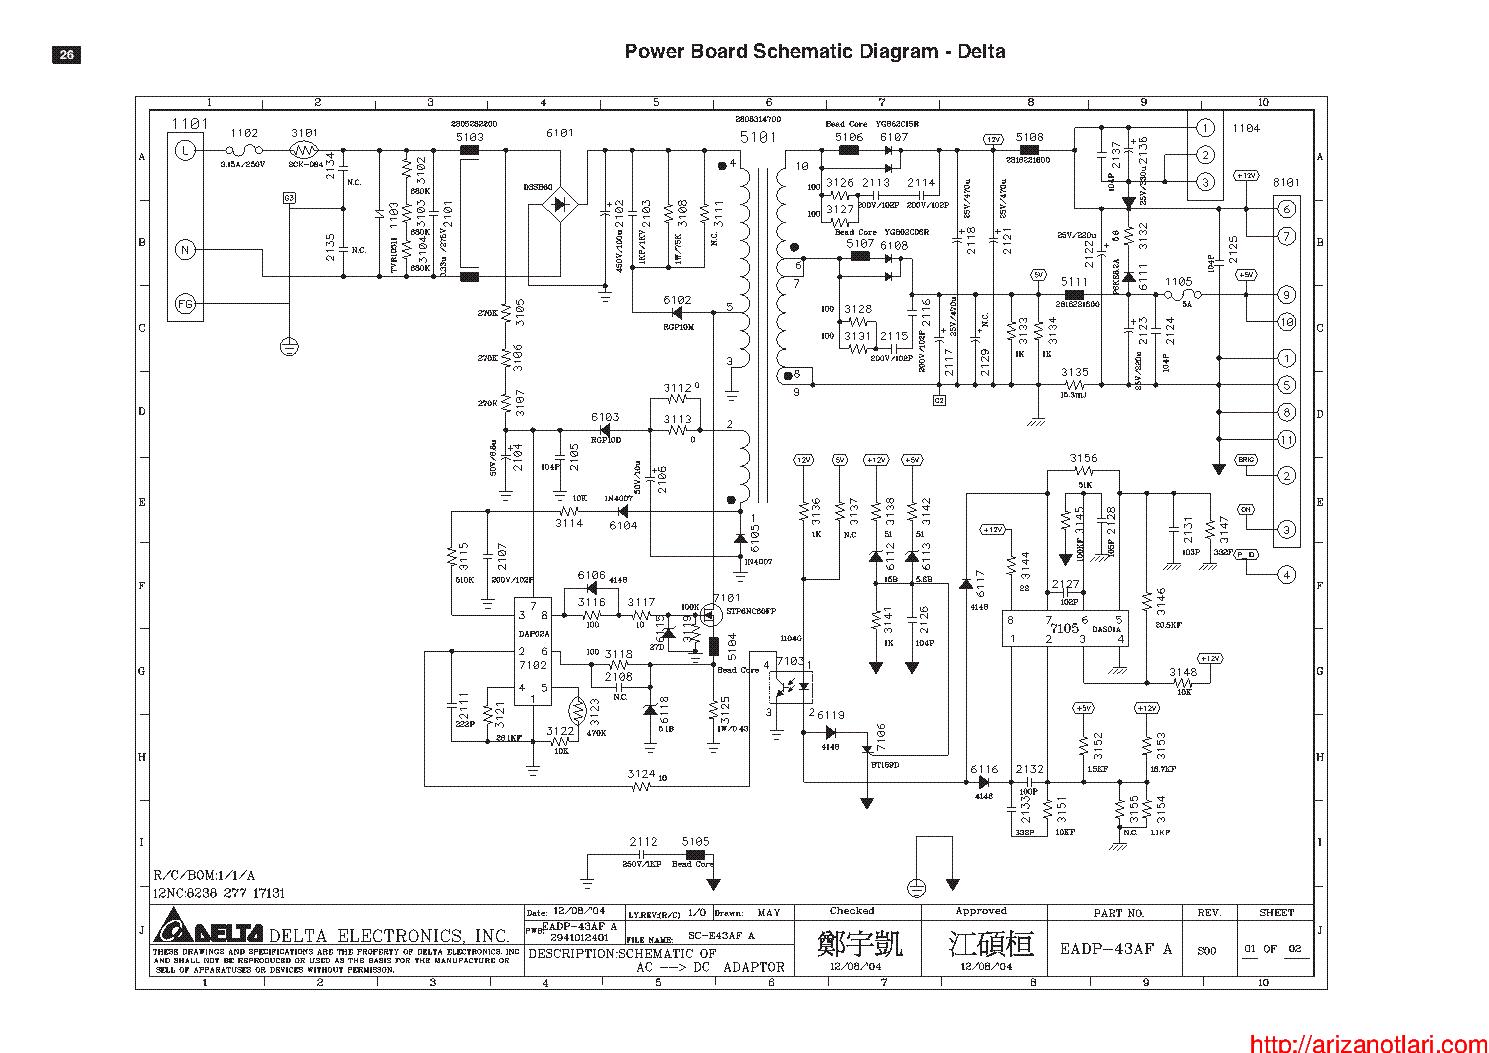 Delta Power Supply Schematic Diagrams Atx Tyxyke5739s Soup Diagram Diy Enthusiasts Wiring U2022 300w